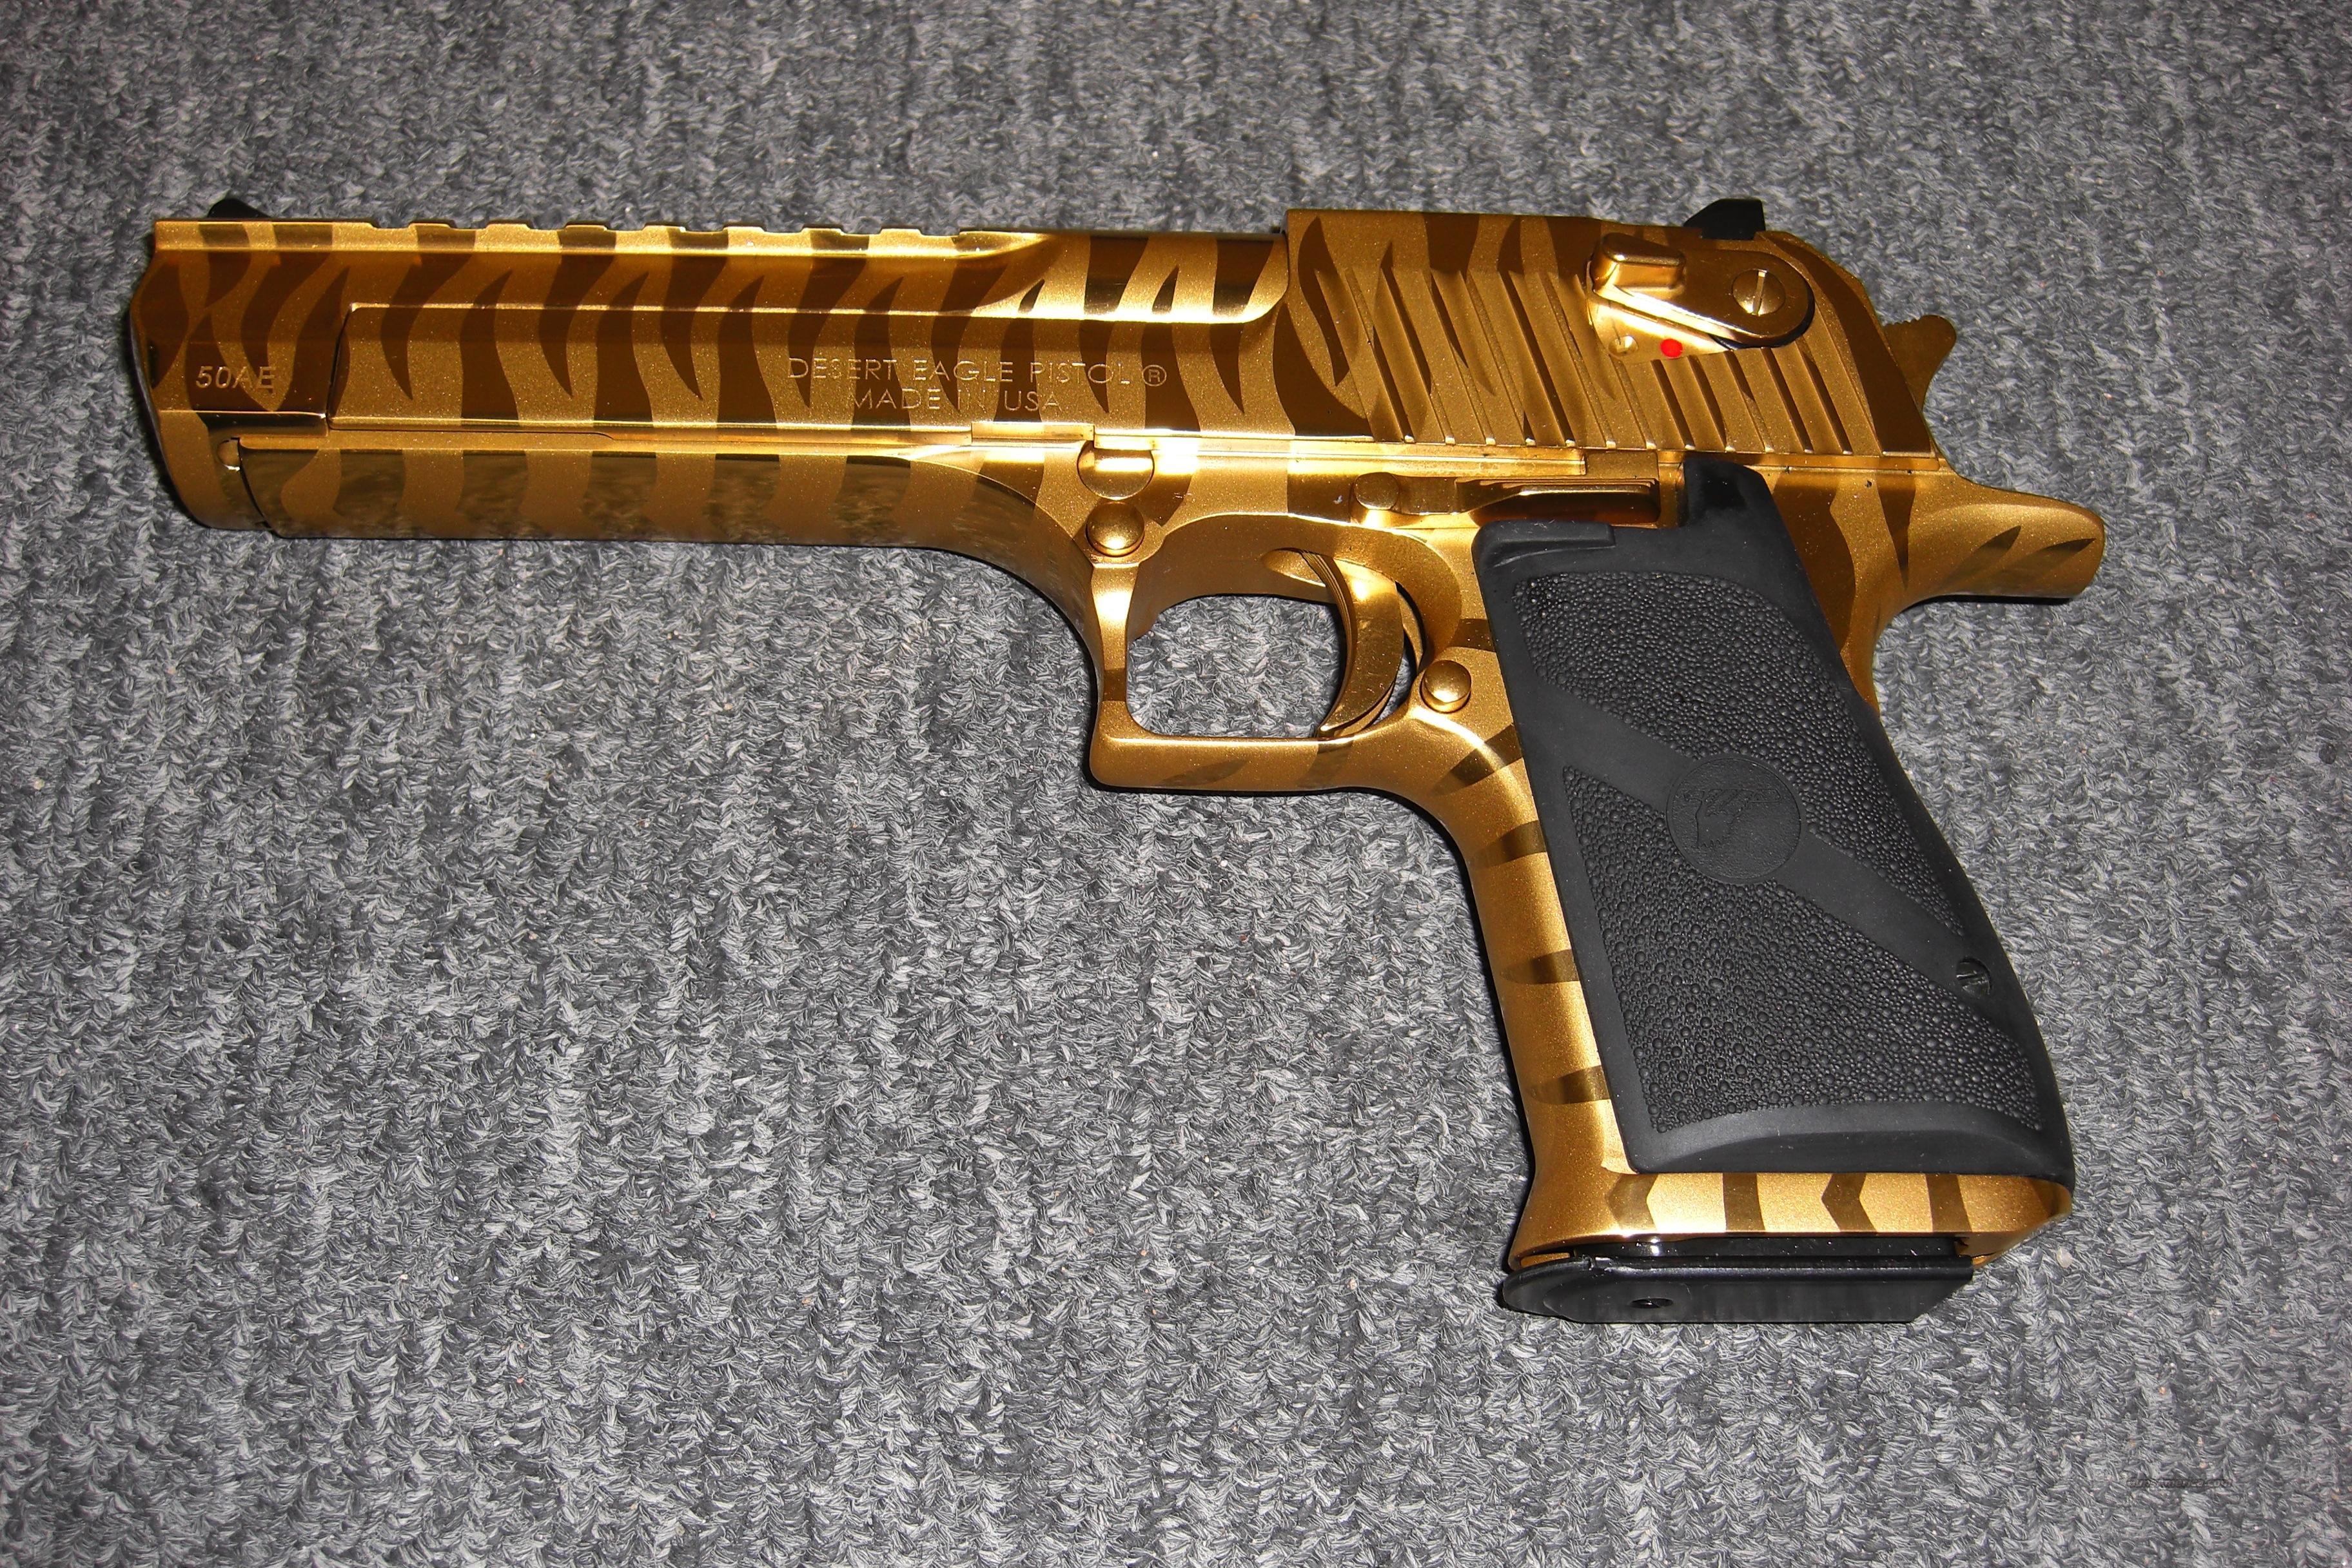 Desert Eagle,357mag, Titanium gold,Bengal tiger... for sale